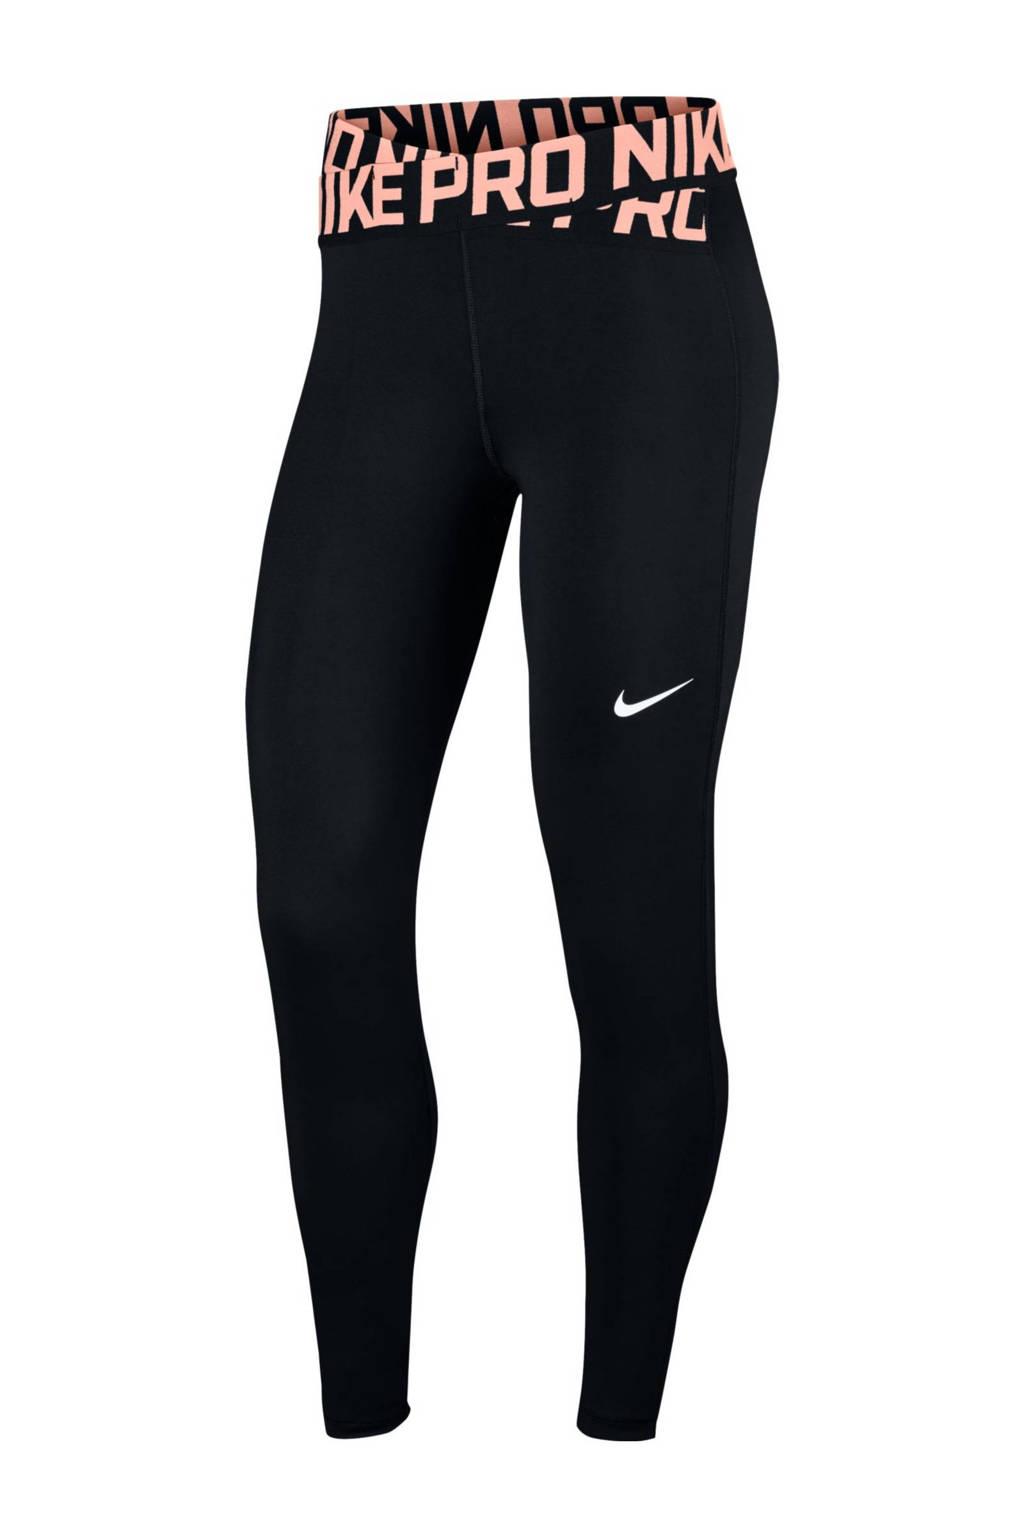 eb56788cf00 Nike 7/8 sportlegging, Zwart/lichtroze